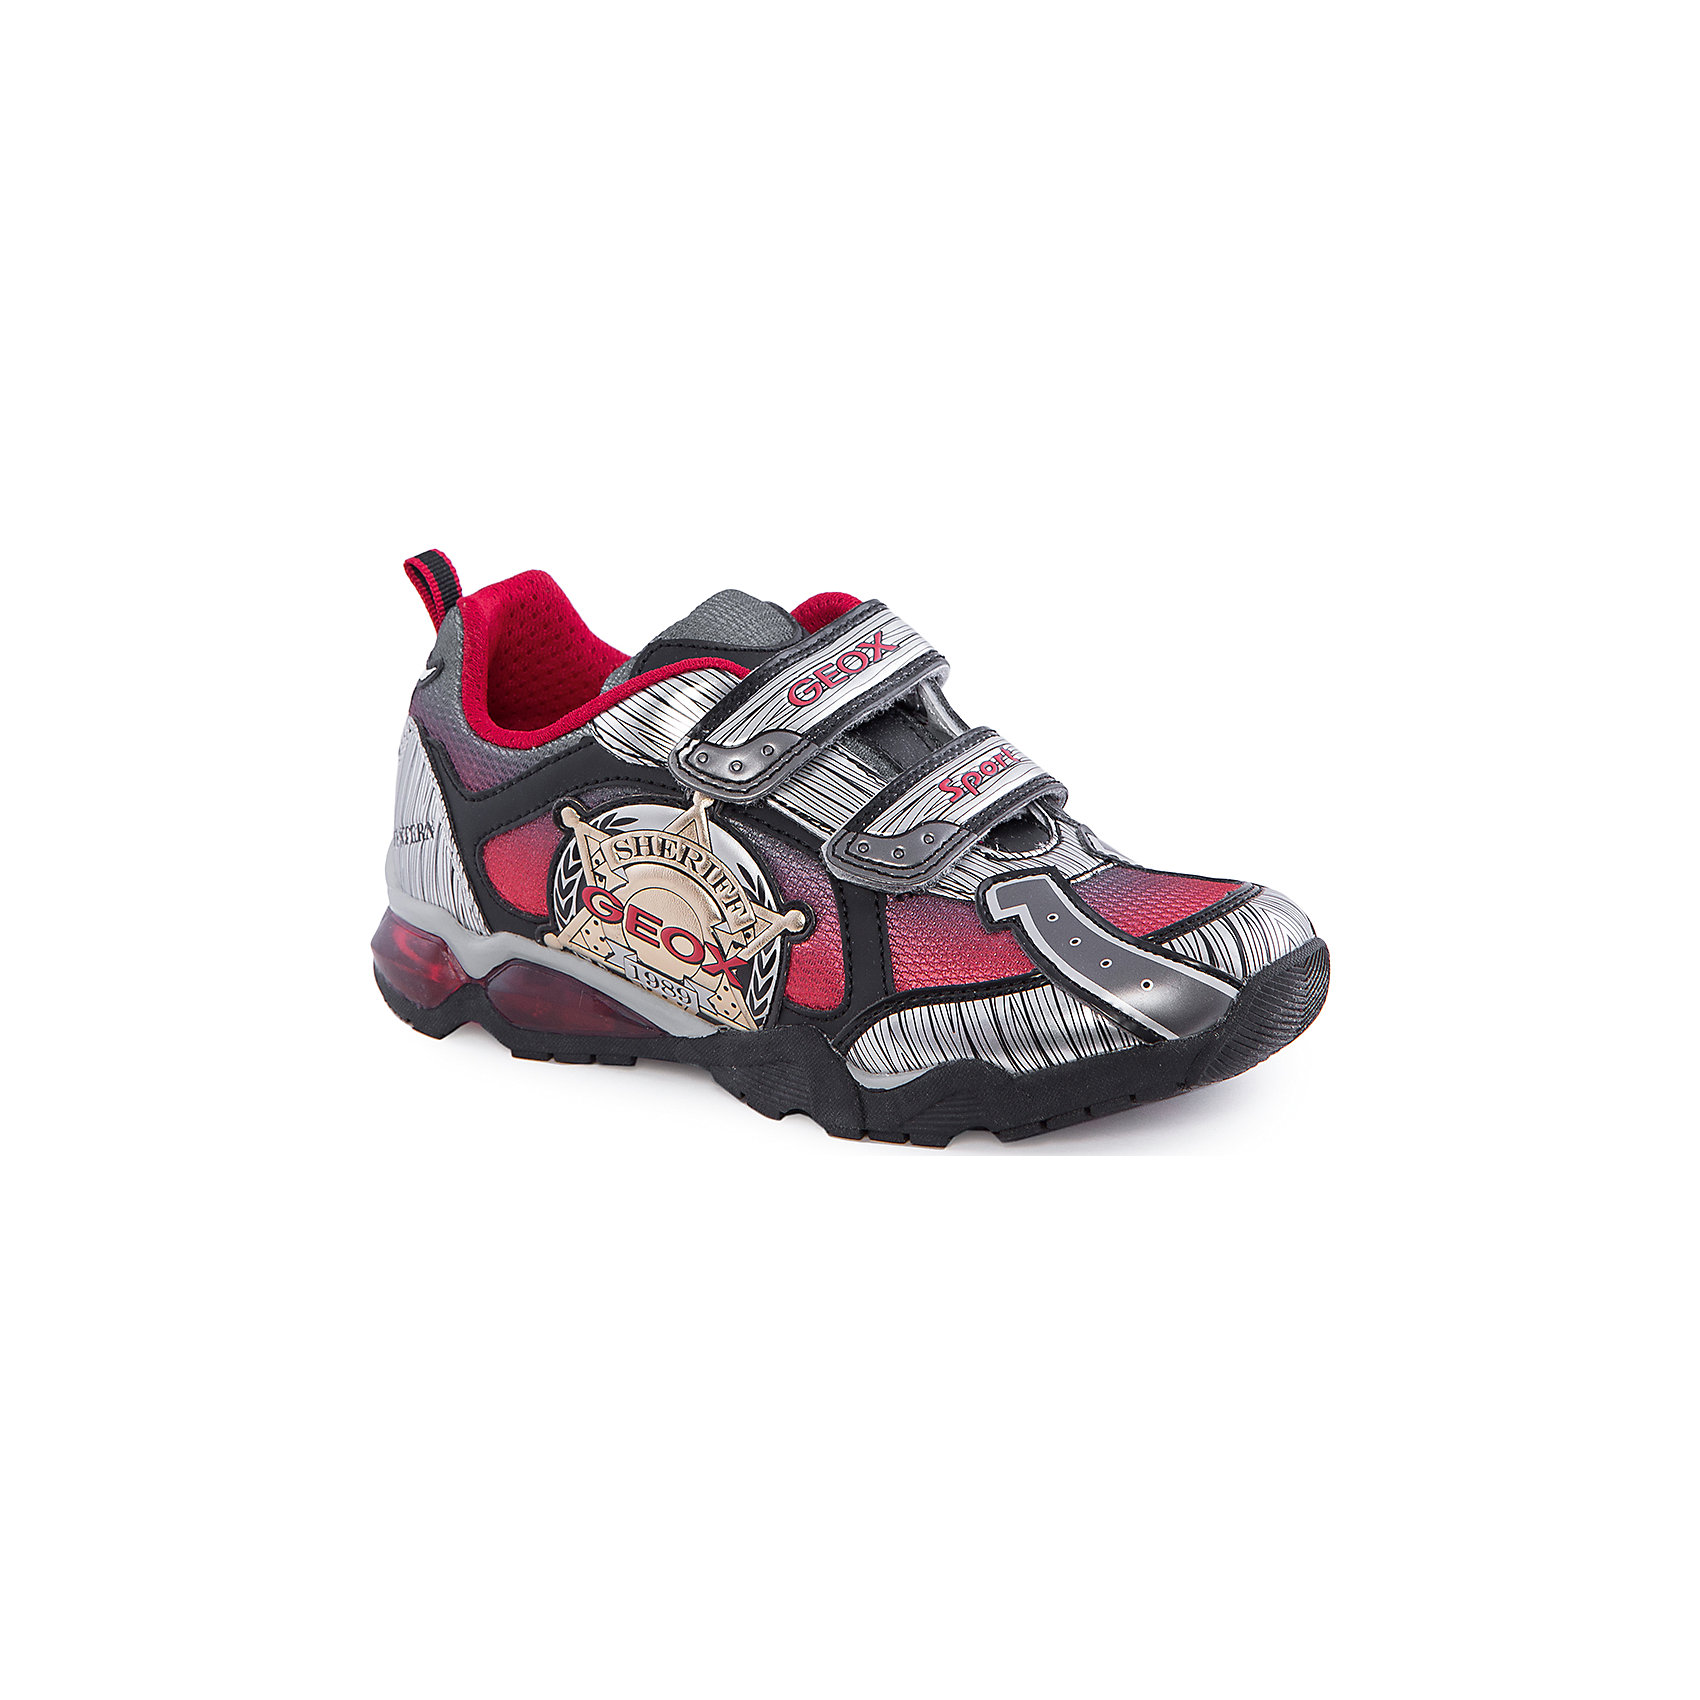 GEOX Кроссовки со светодиодами для мальчика GEOX geox ботинки для мальчика geox